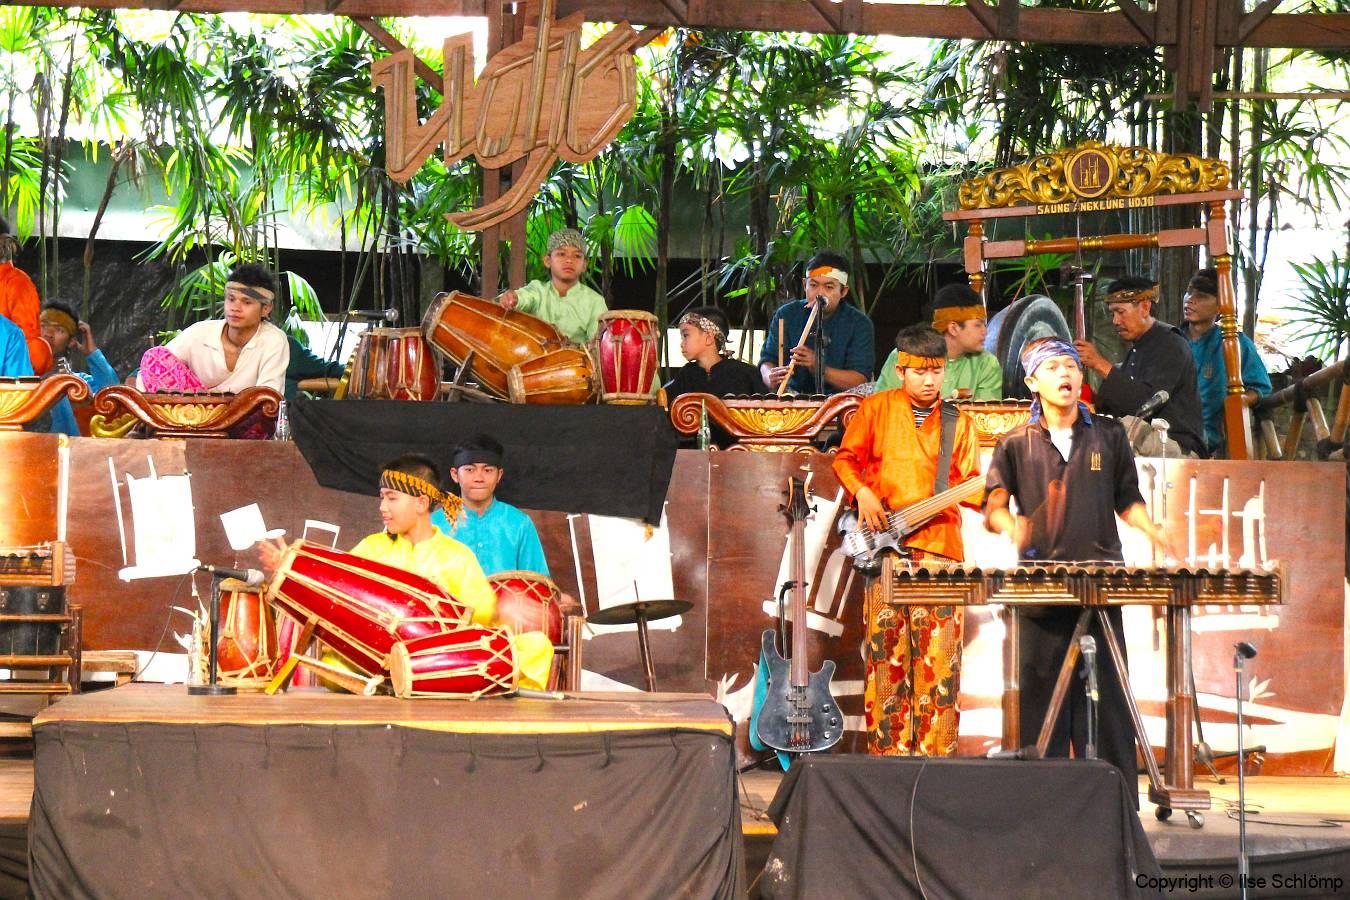 Java, Padasuka, Bambus Musik-Orchester, Traditionelle Angklung-Musik